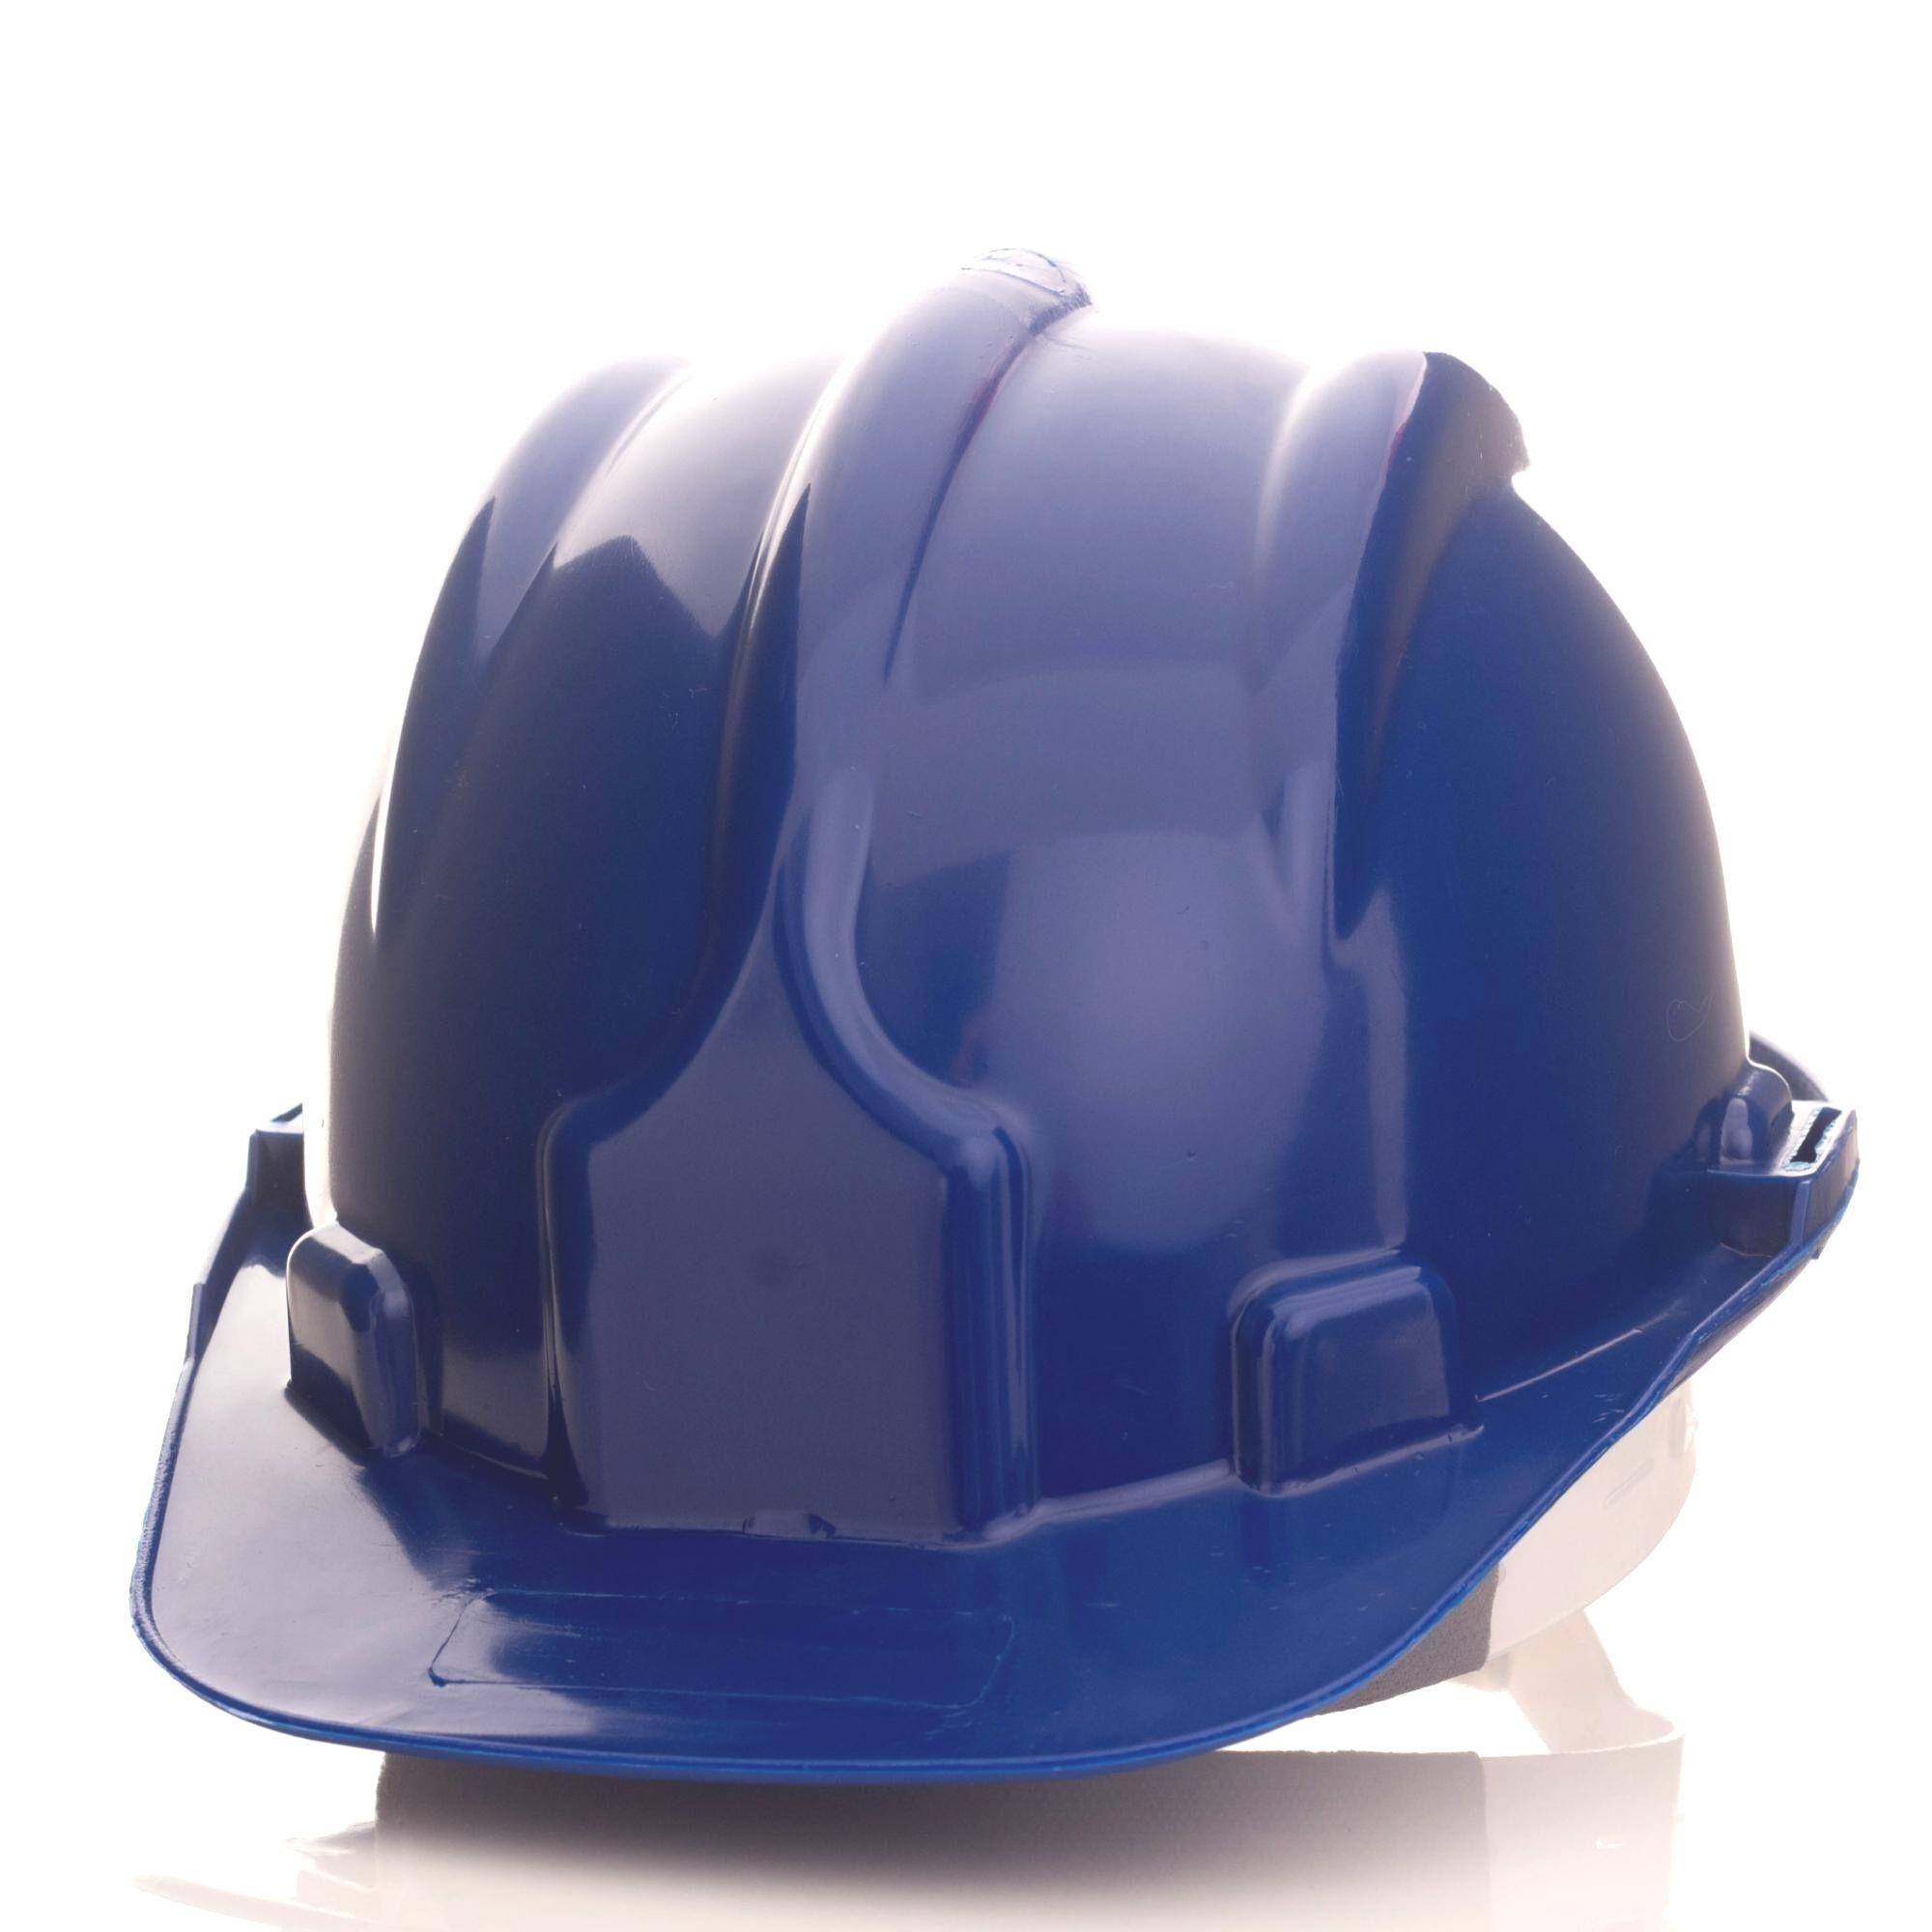 Capacete de Segurança classe B completo com Jugular - Plastcor - C.A. 31469